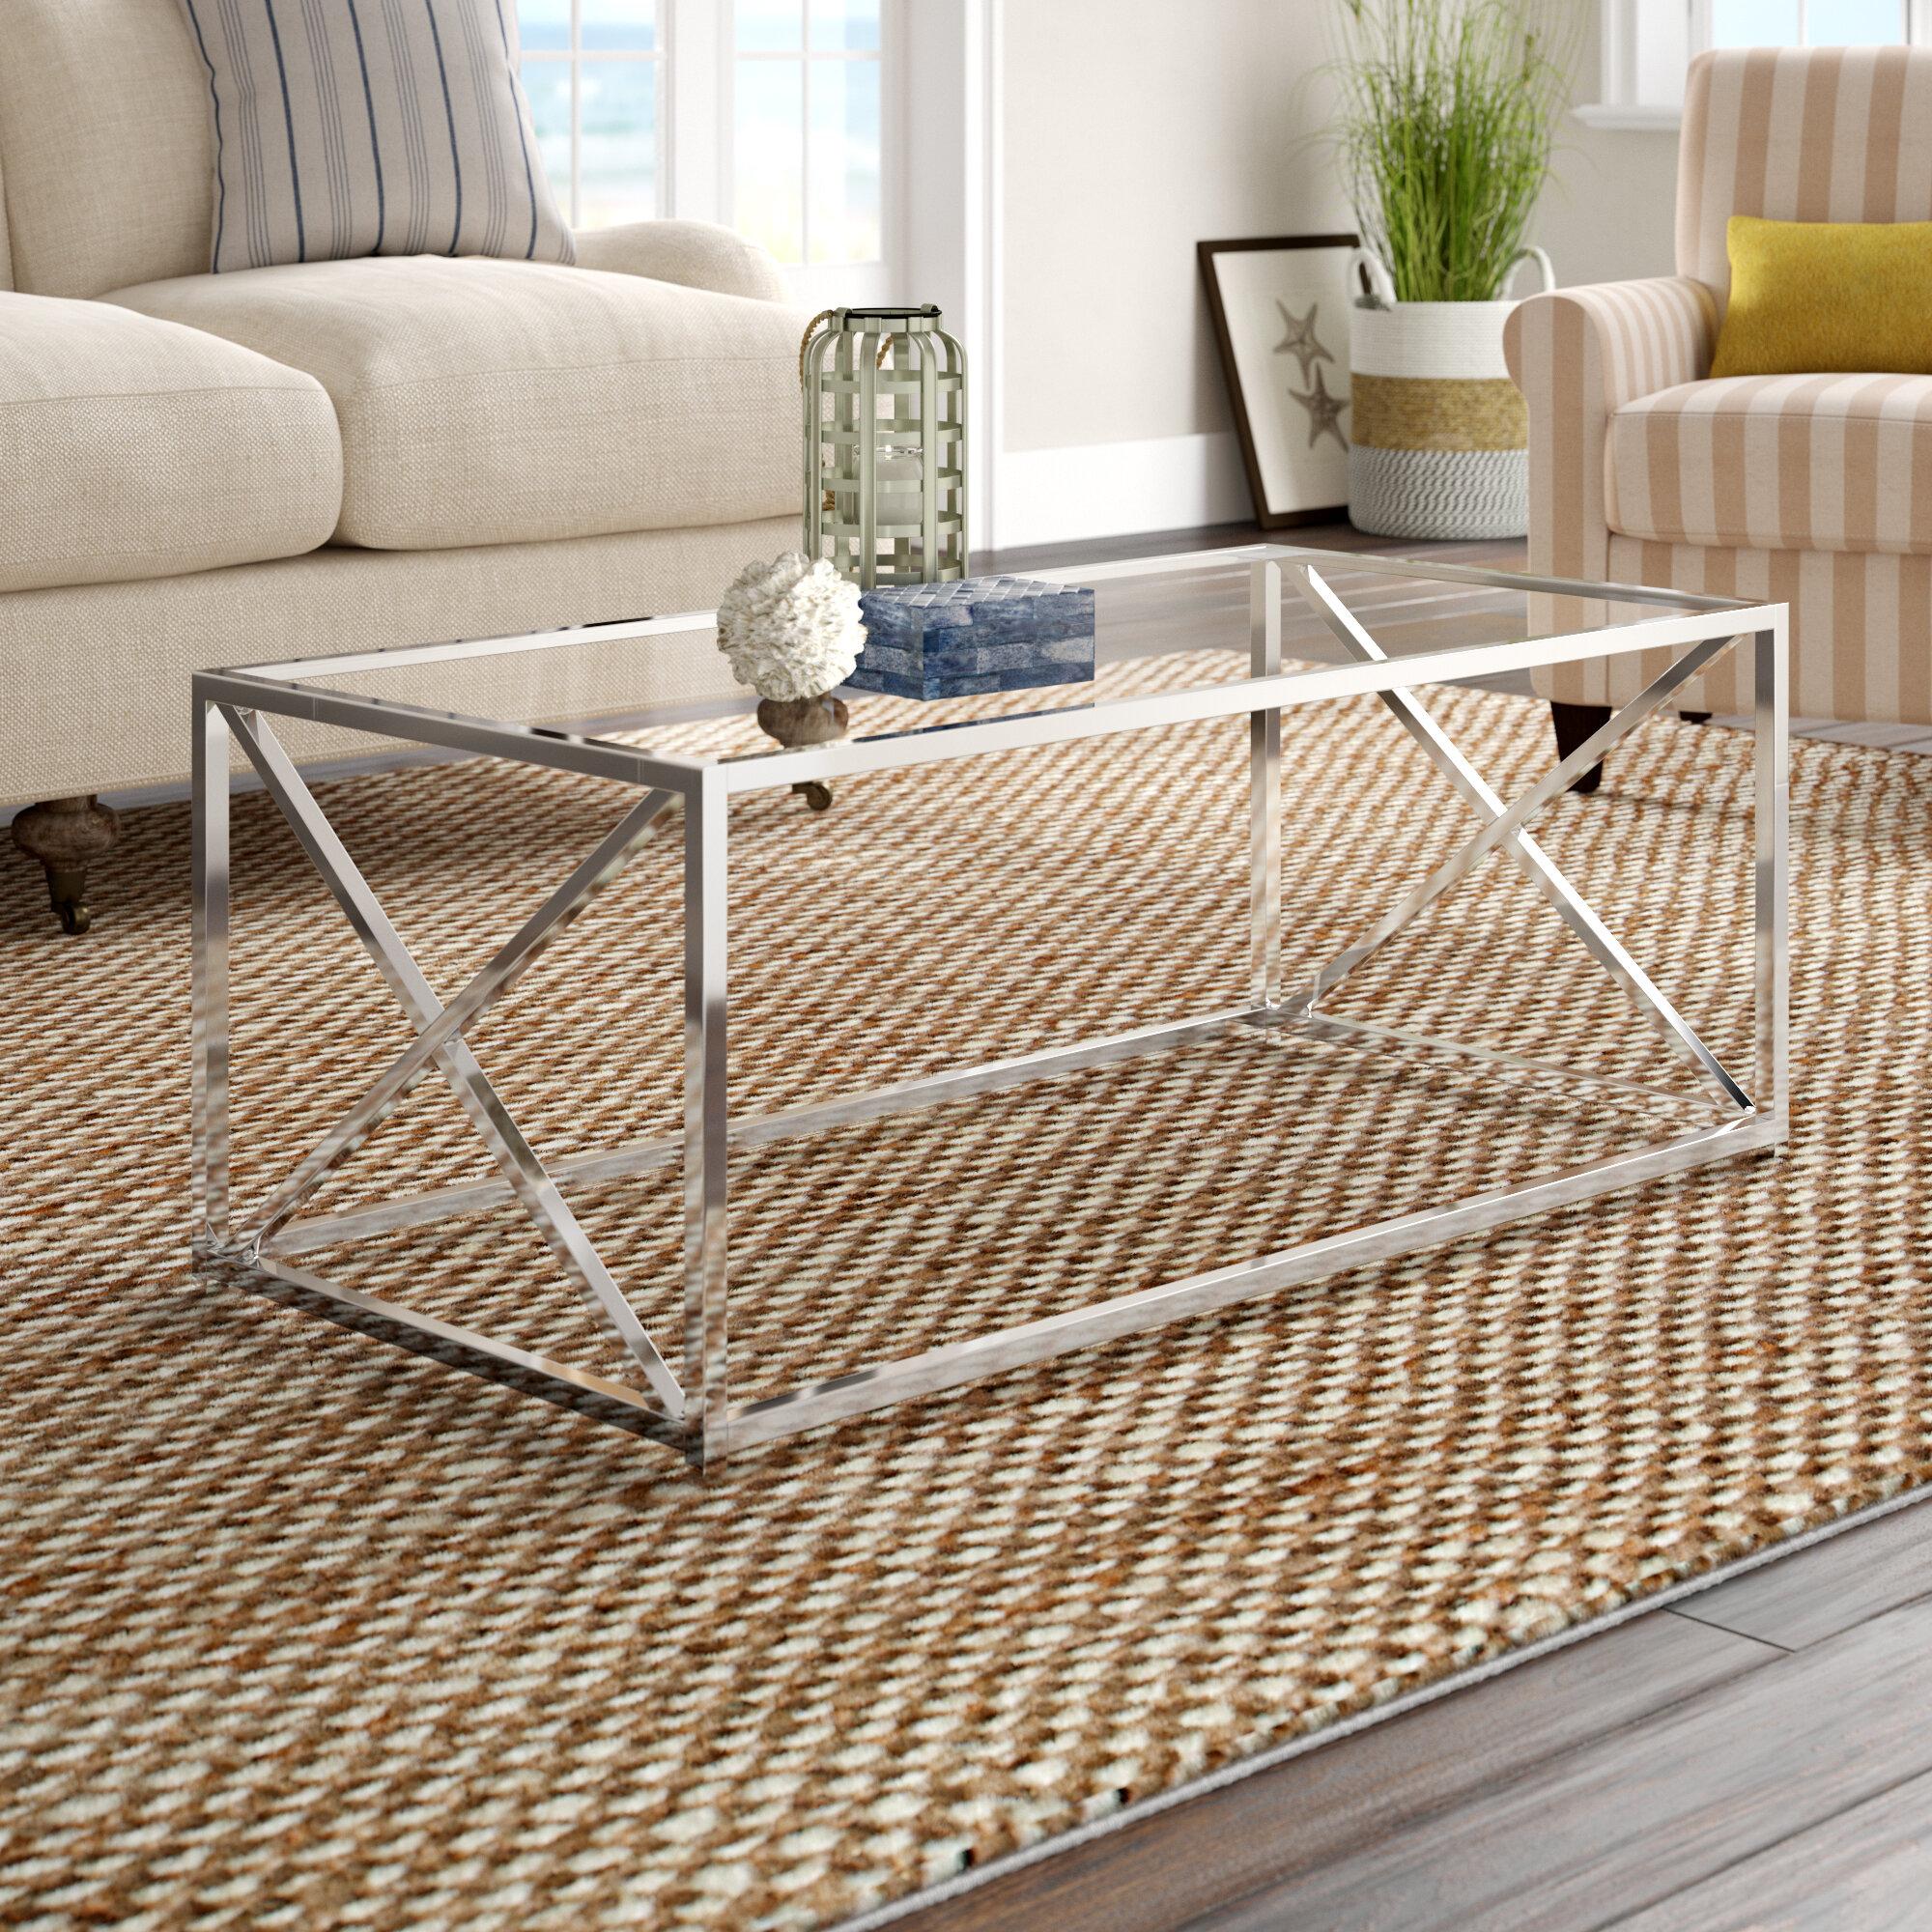 Amazing Wayfair Living Room Tables